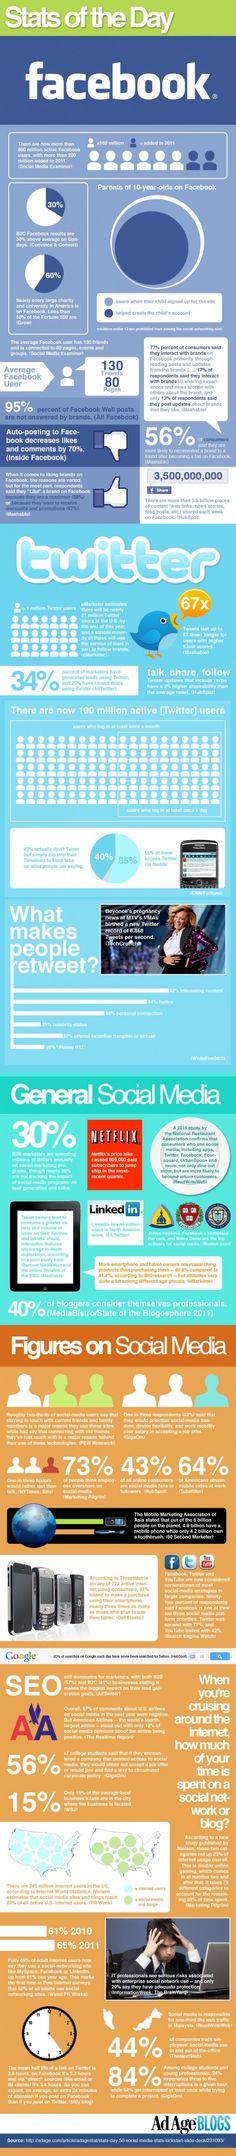 Social media statistics 2012 (infographic)